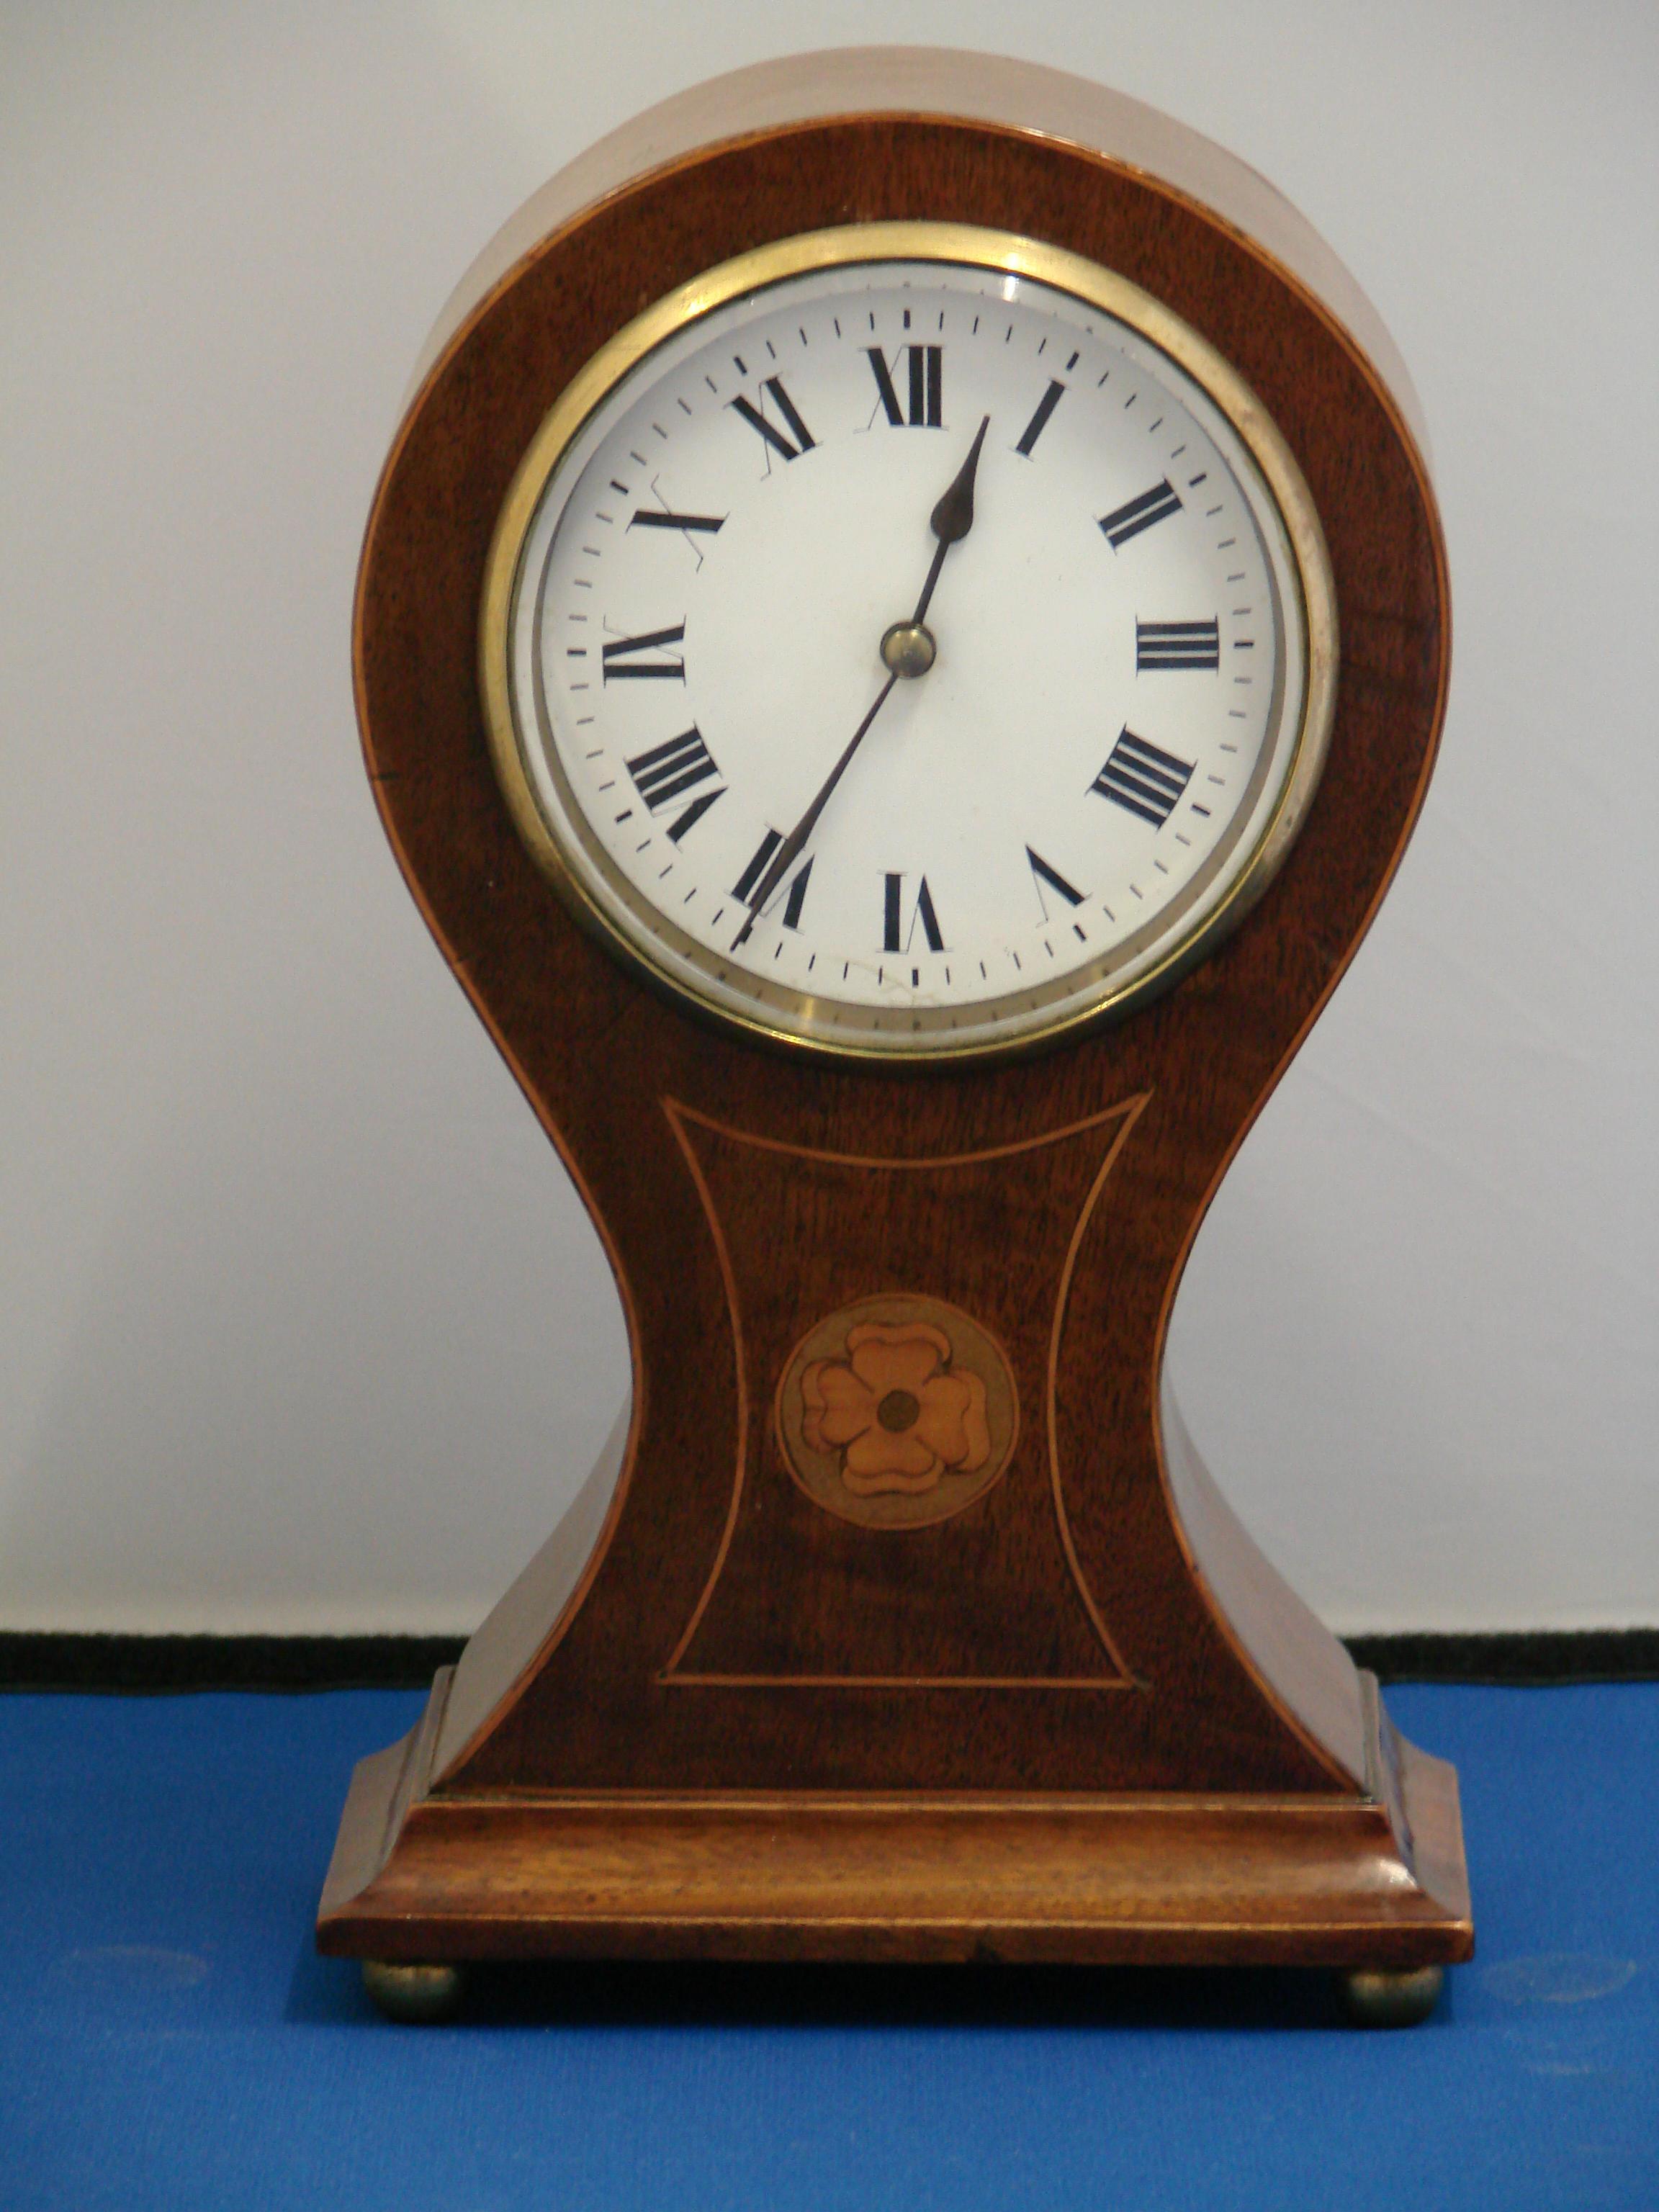 Antique Mantel Clocks >> Mantel clock | Antique Clock | Inlaid balloon Clock